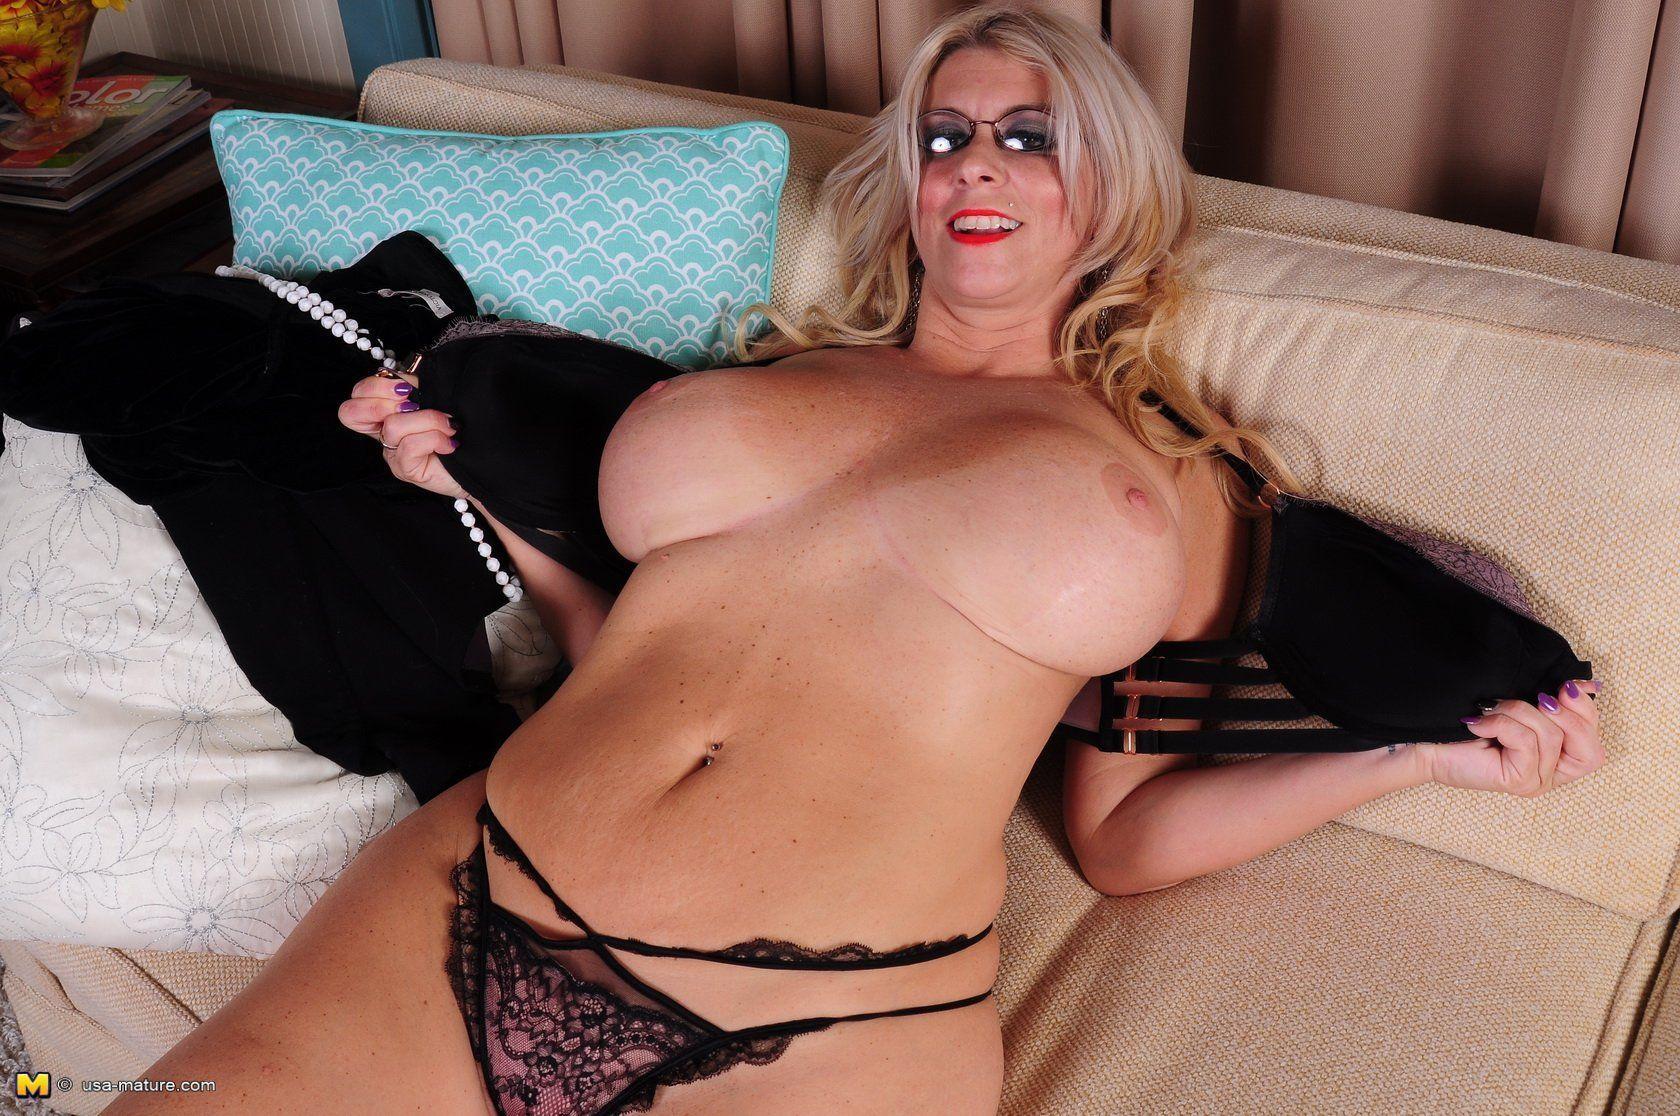 Hot midget nude female ass hole